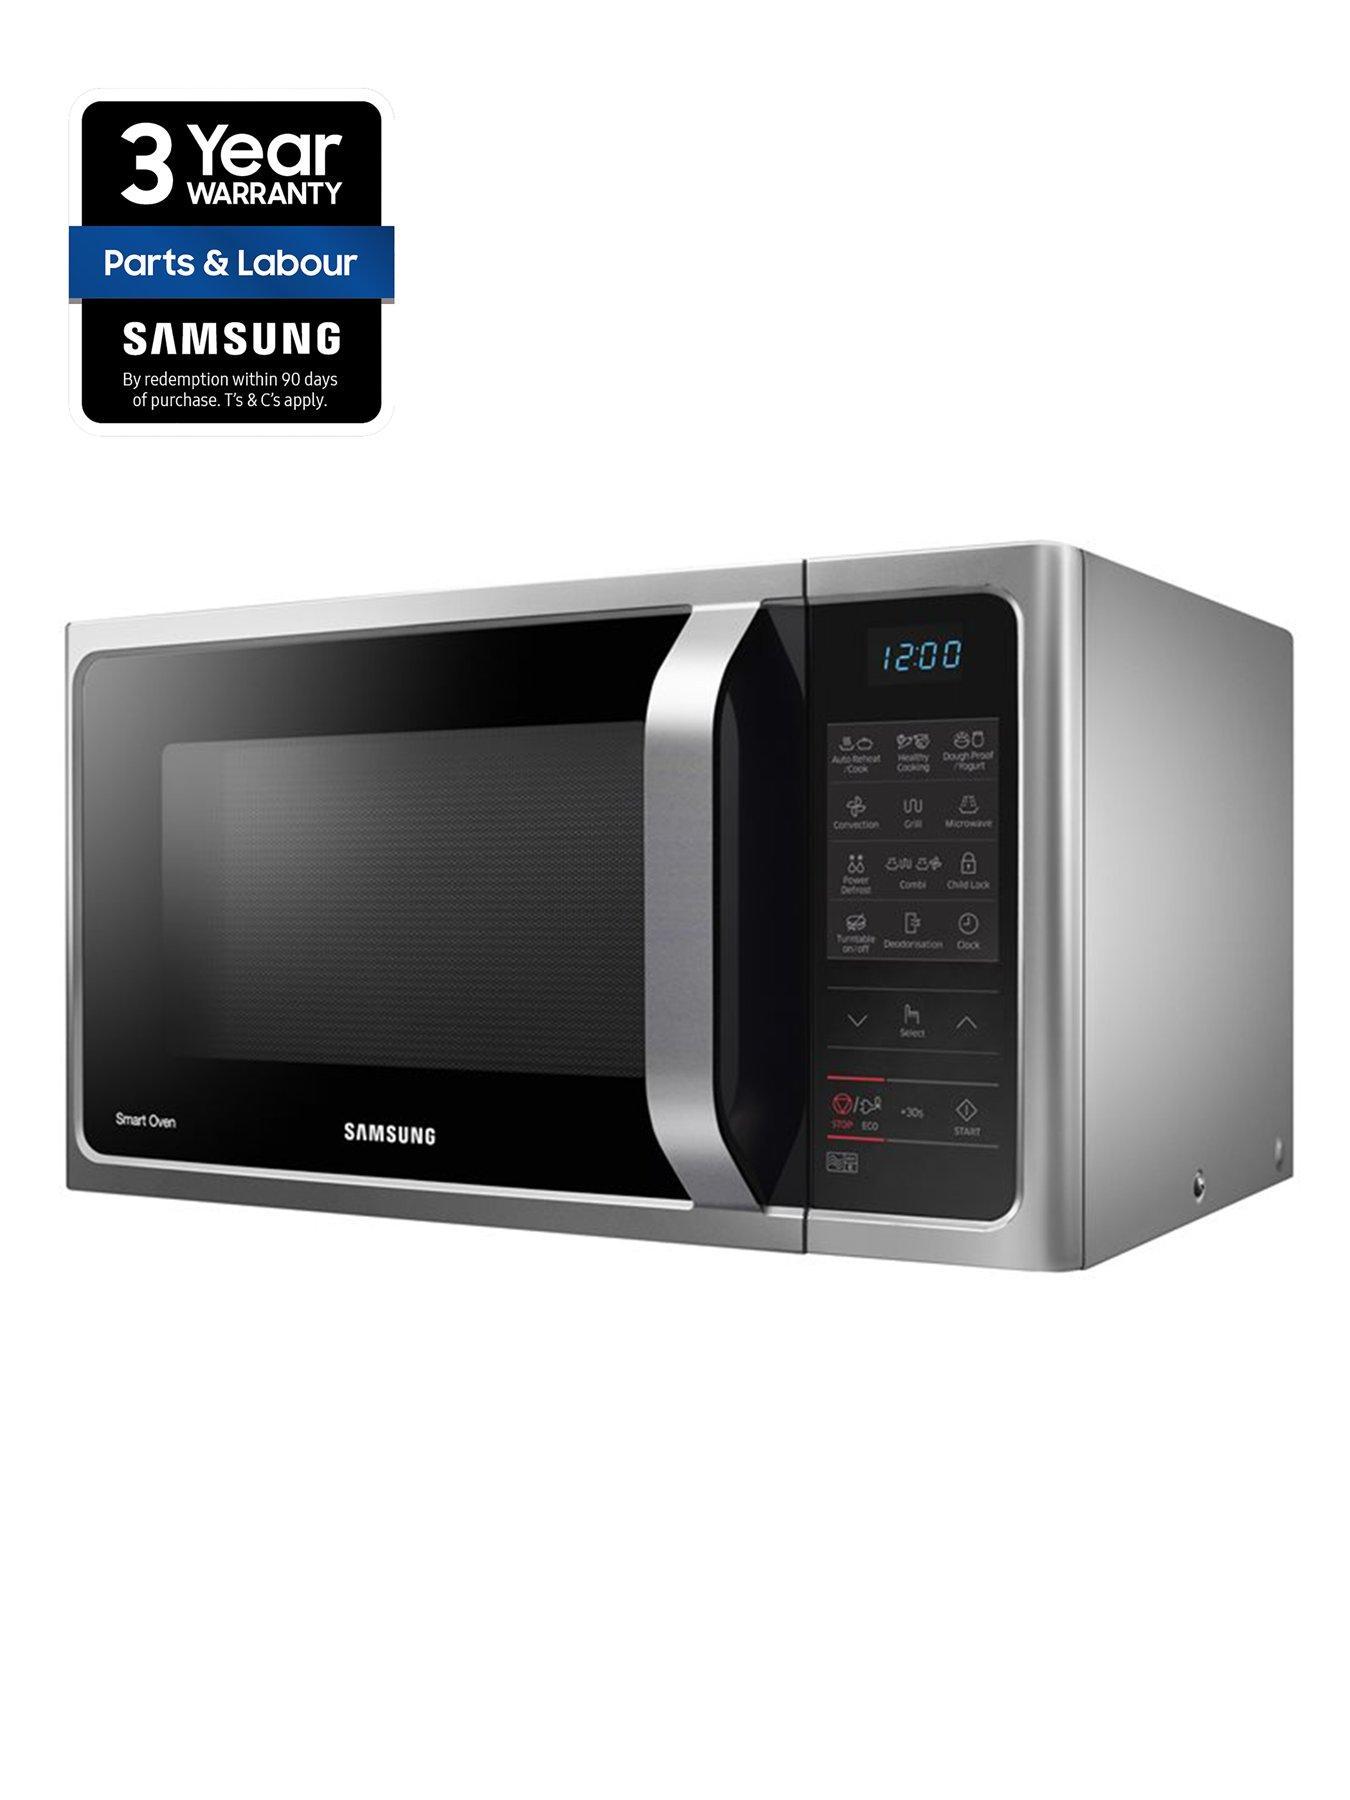 mc28h5013as eu 28 litre convection microwave oven with ceramic enamel interior silver